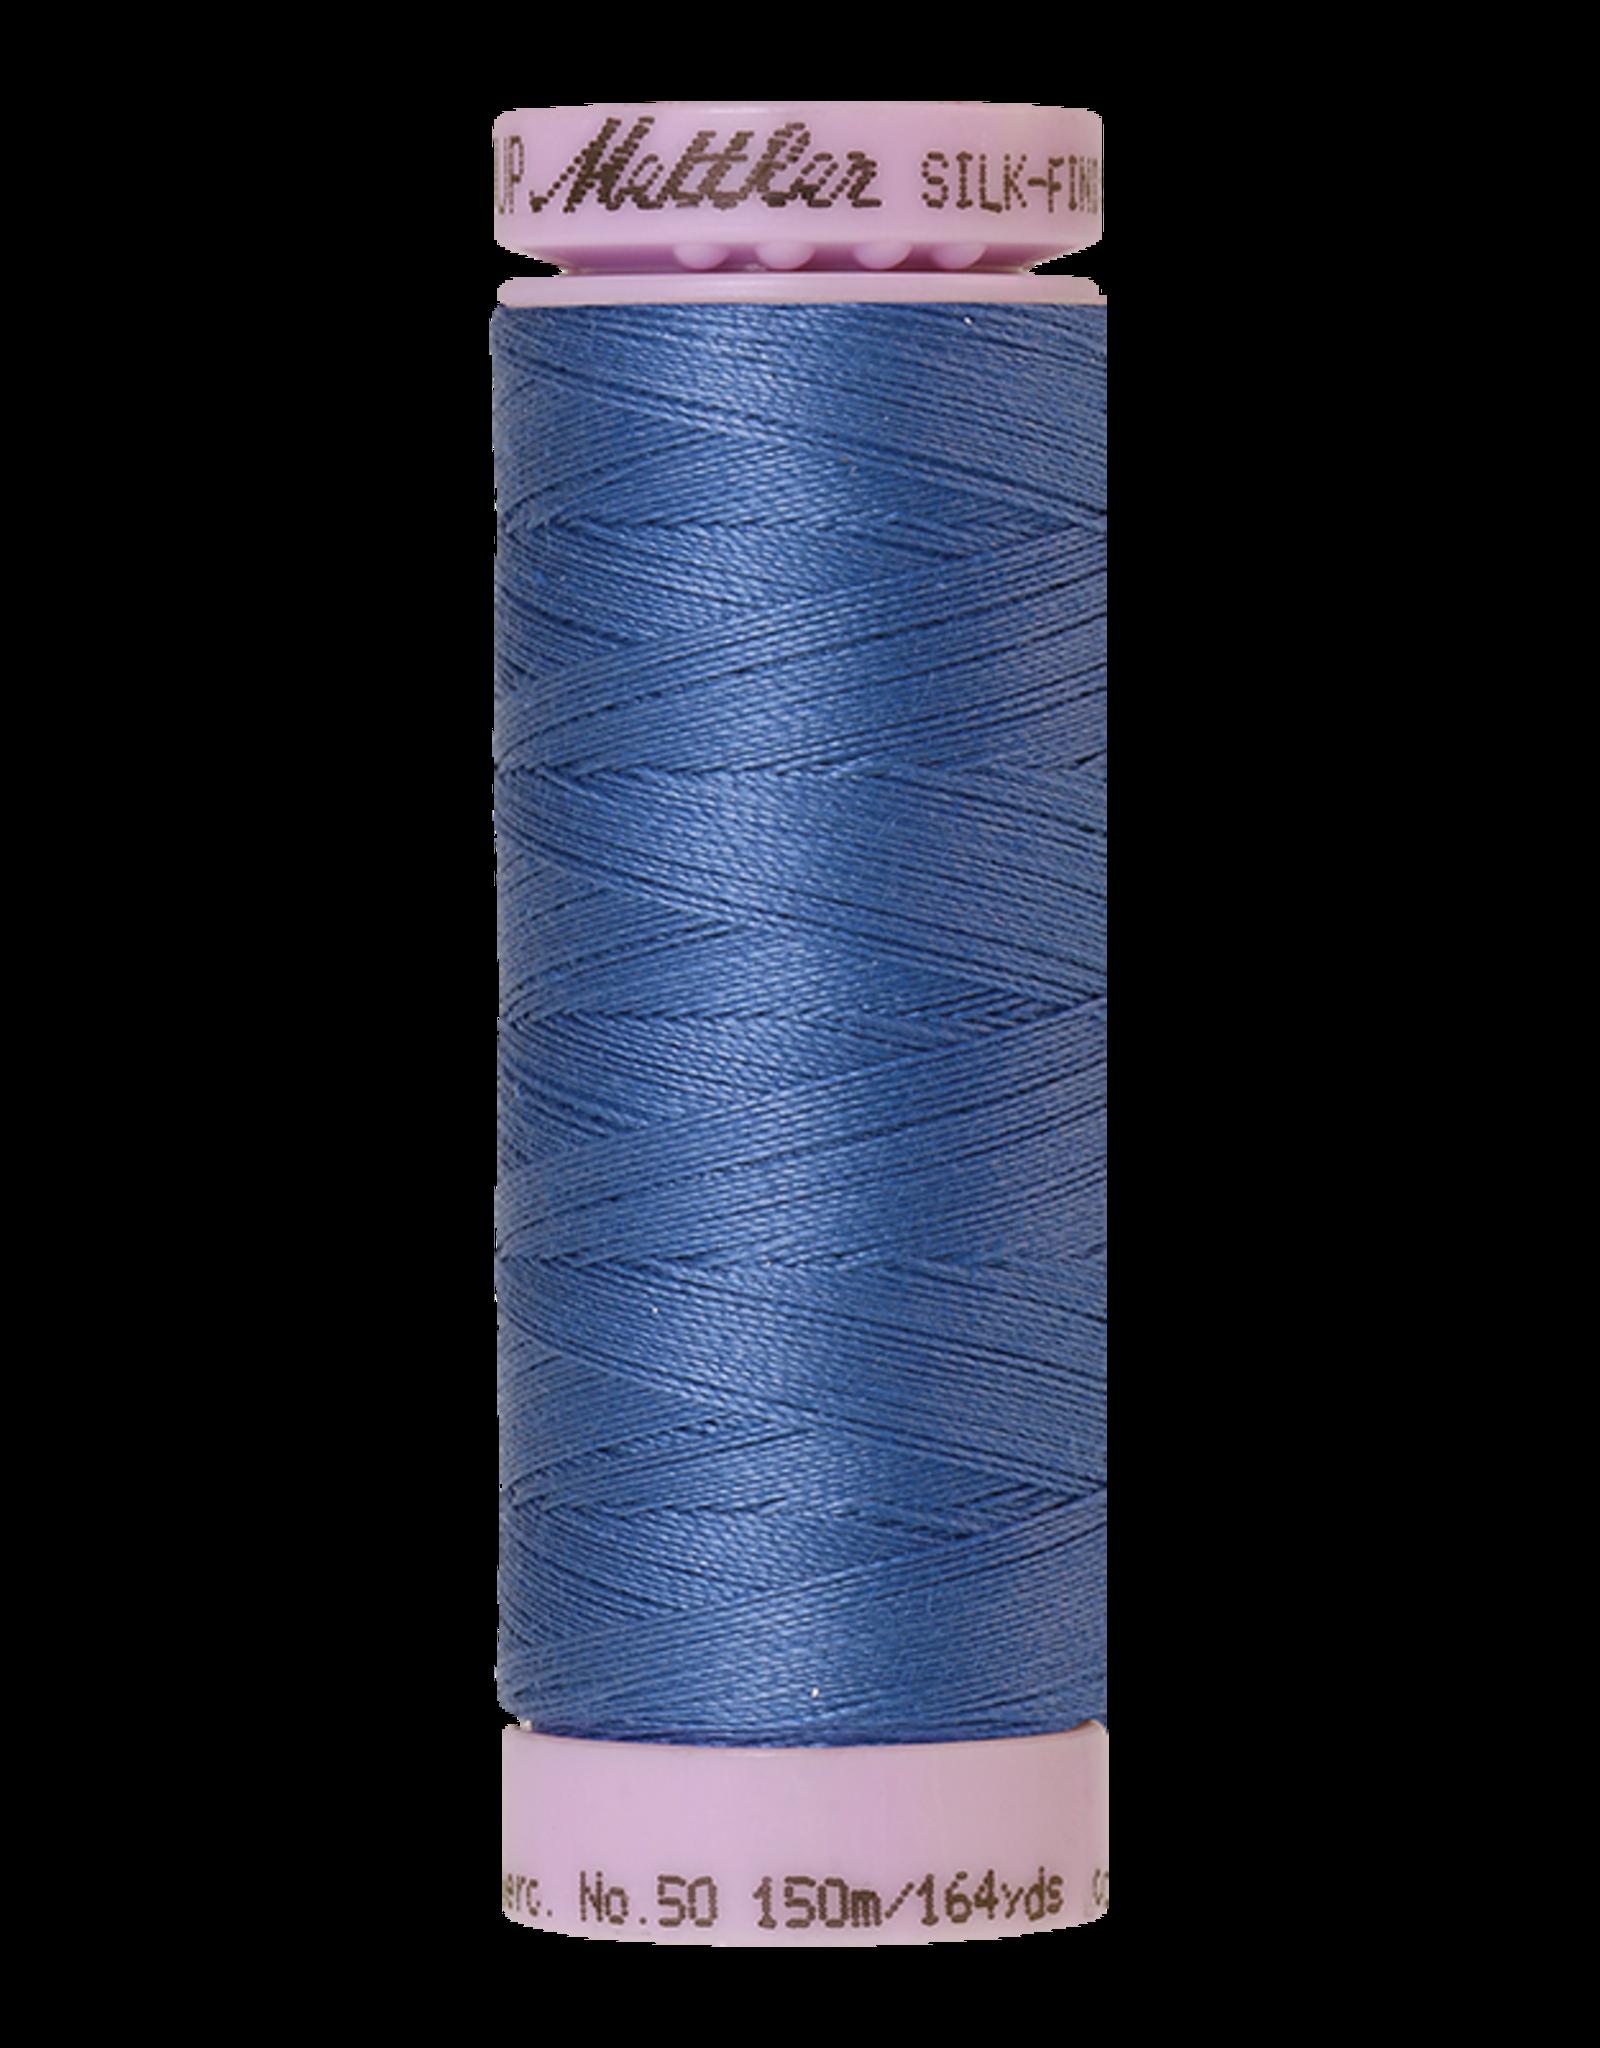 Mettler Silk Finish Cotton 50 - 150 meter - 1464